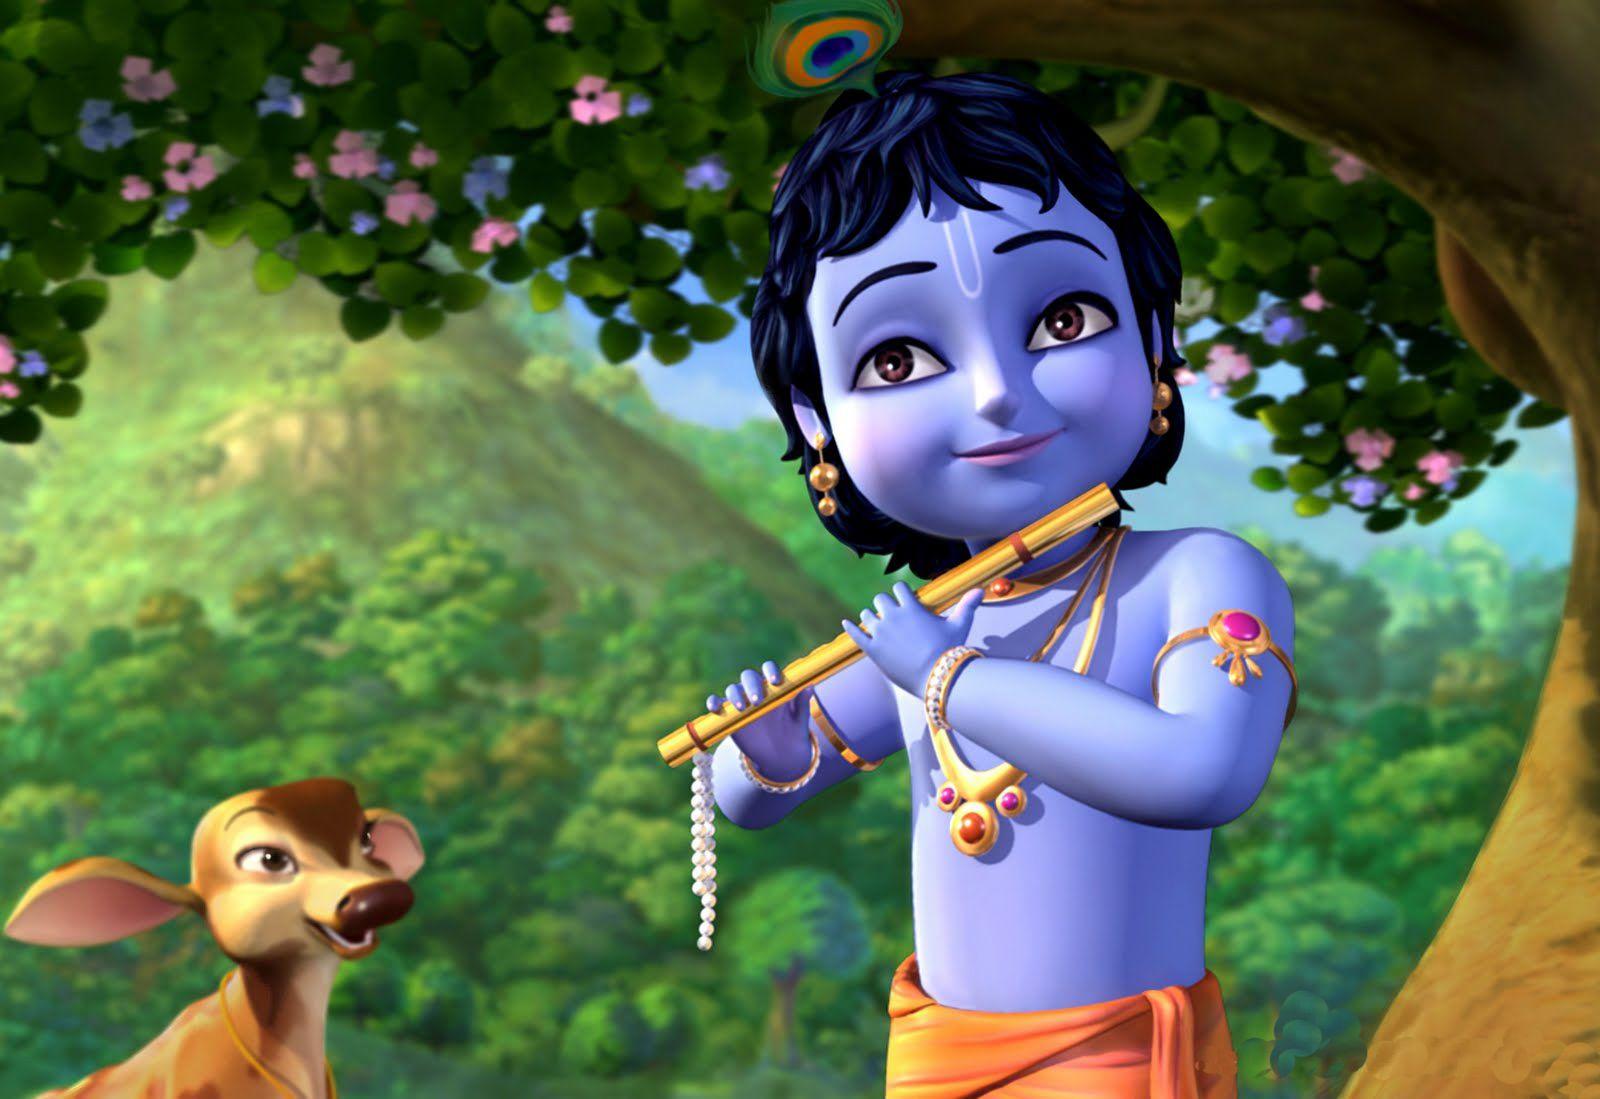 Desktop Collection Of Cartoon In Hd On Spyder Wallpaper Full 3d Pics Mobile Phones Wallpapers In 2020 Cartoons Krishna Cartoon Wallpaper Hd Little Krishna